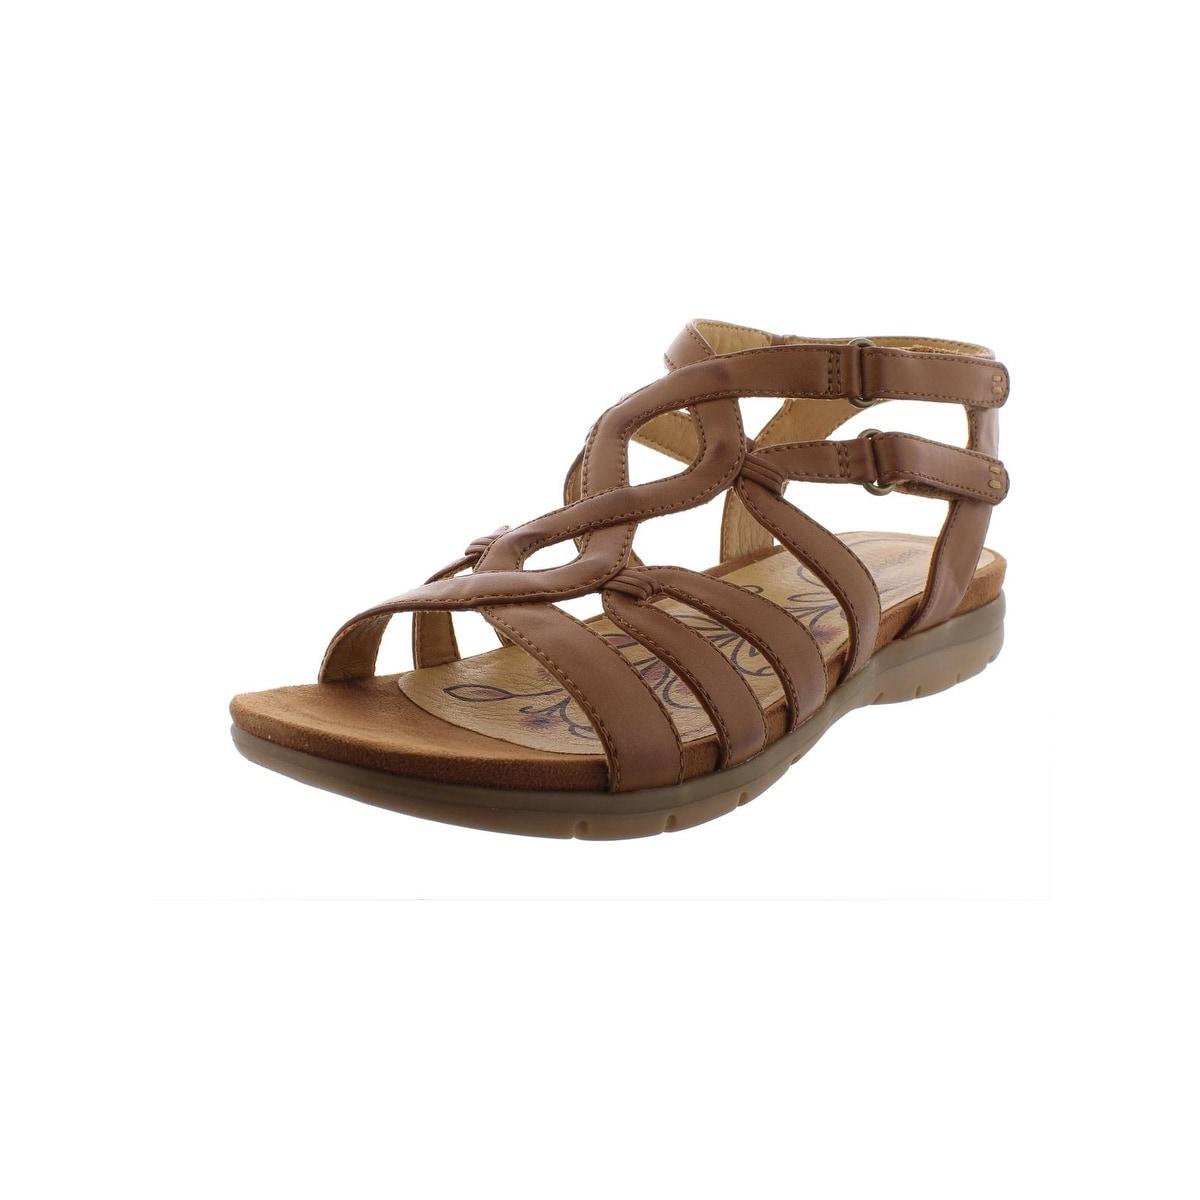 303a4a7a106 Buy Baretraps Women s Sandals Online at Overstock